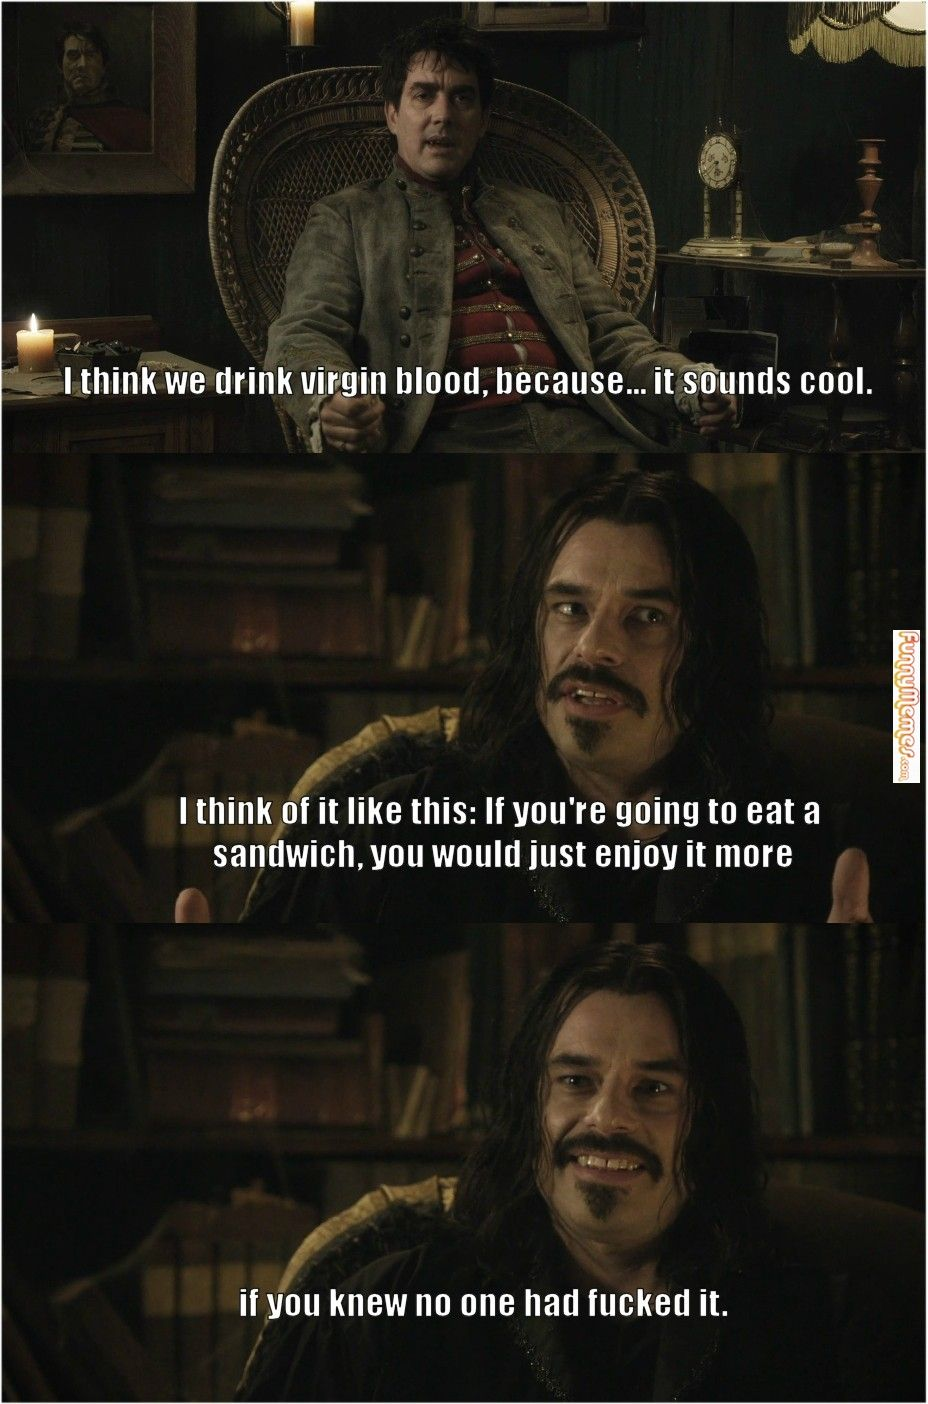 Funny memes Why vampires prefer virgins...